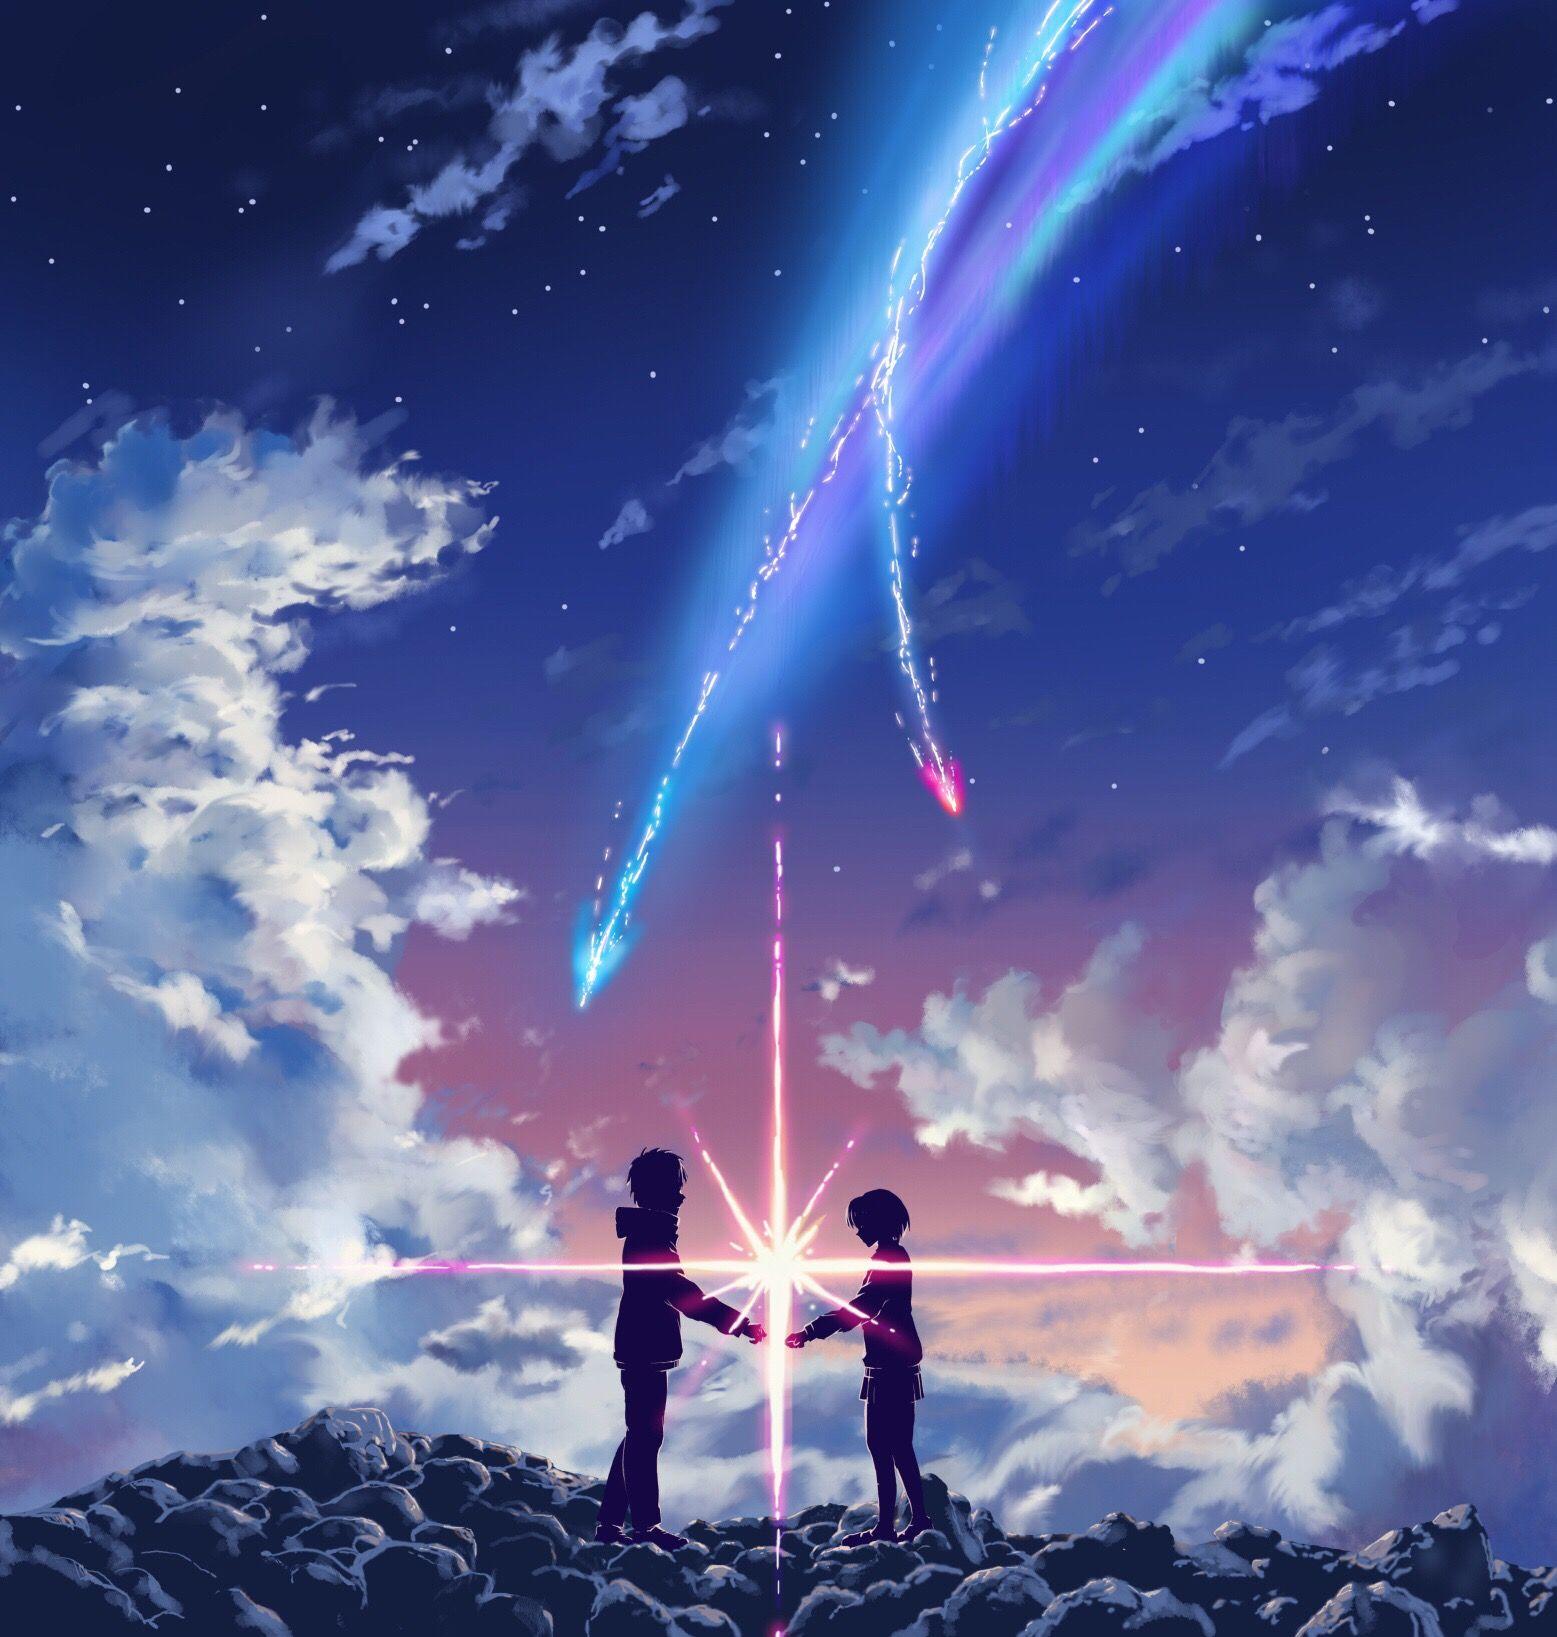 Full hd your name anime wallpaper